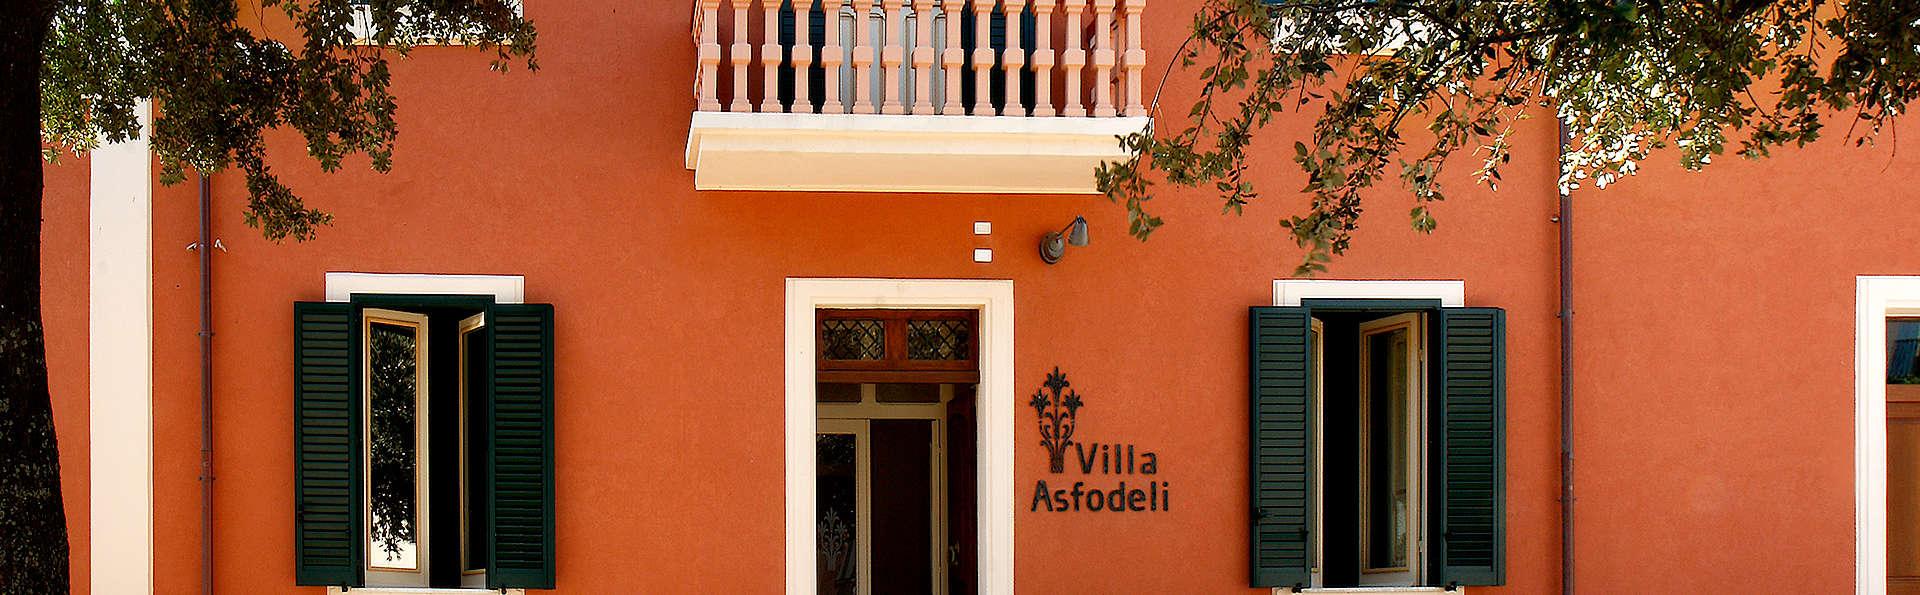 Villa Asfodeli - Edit_Front.jpg